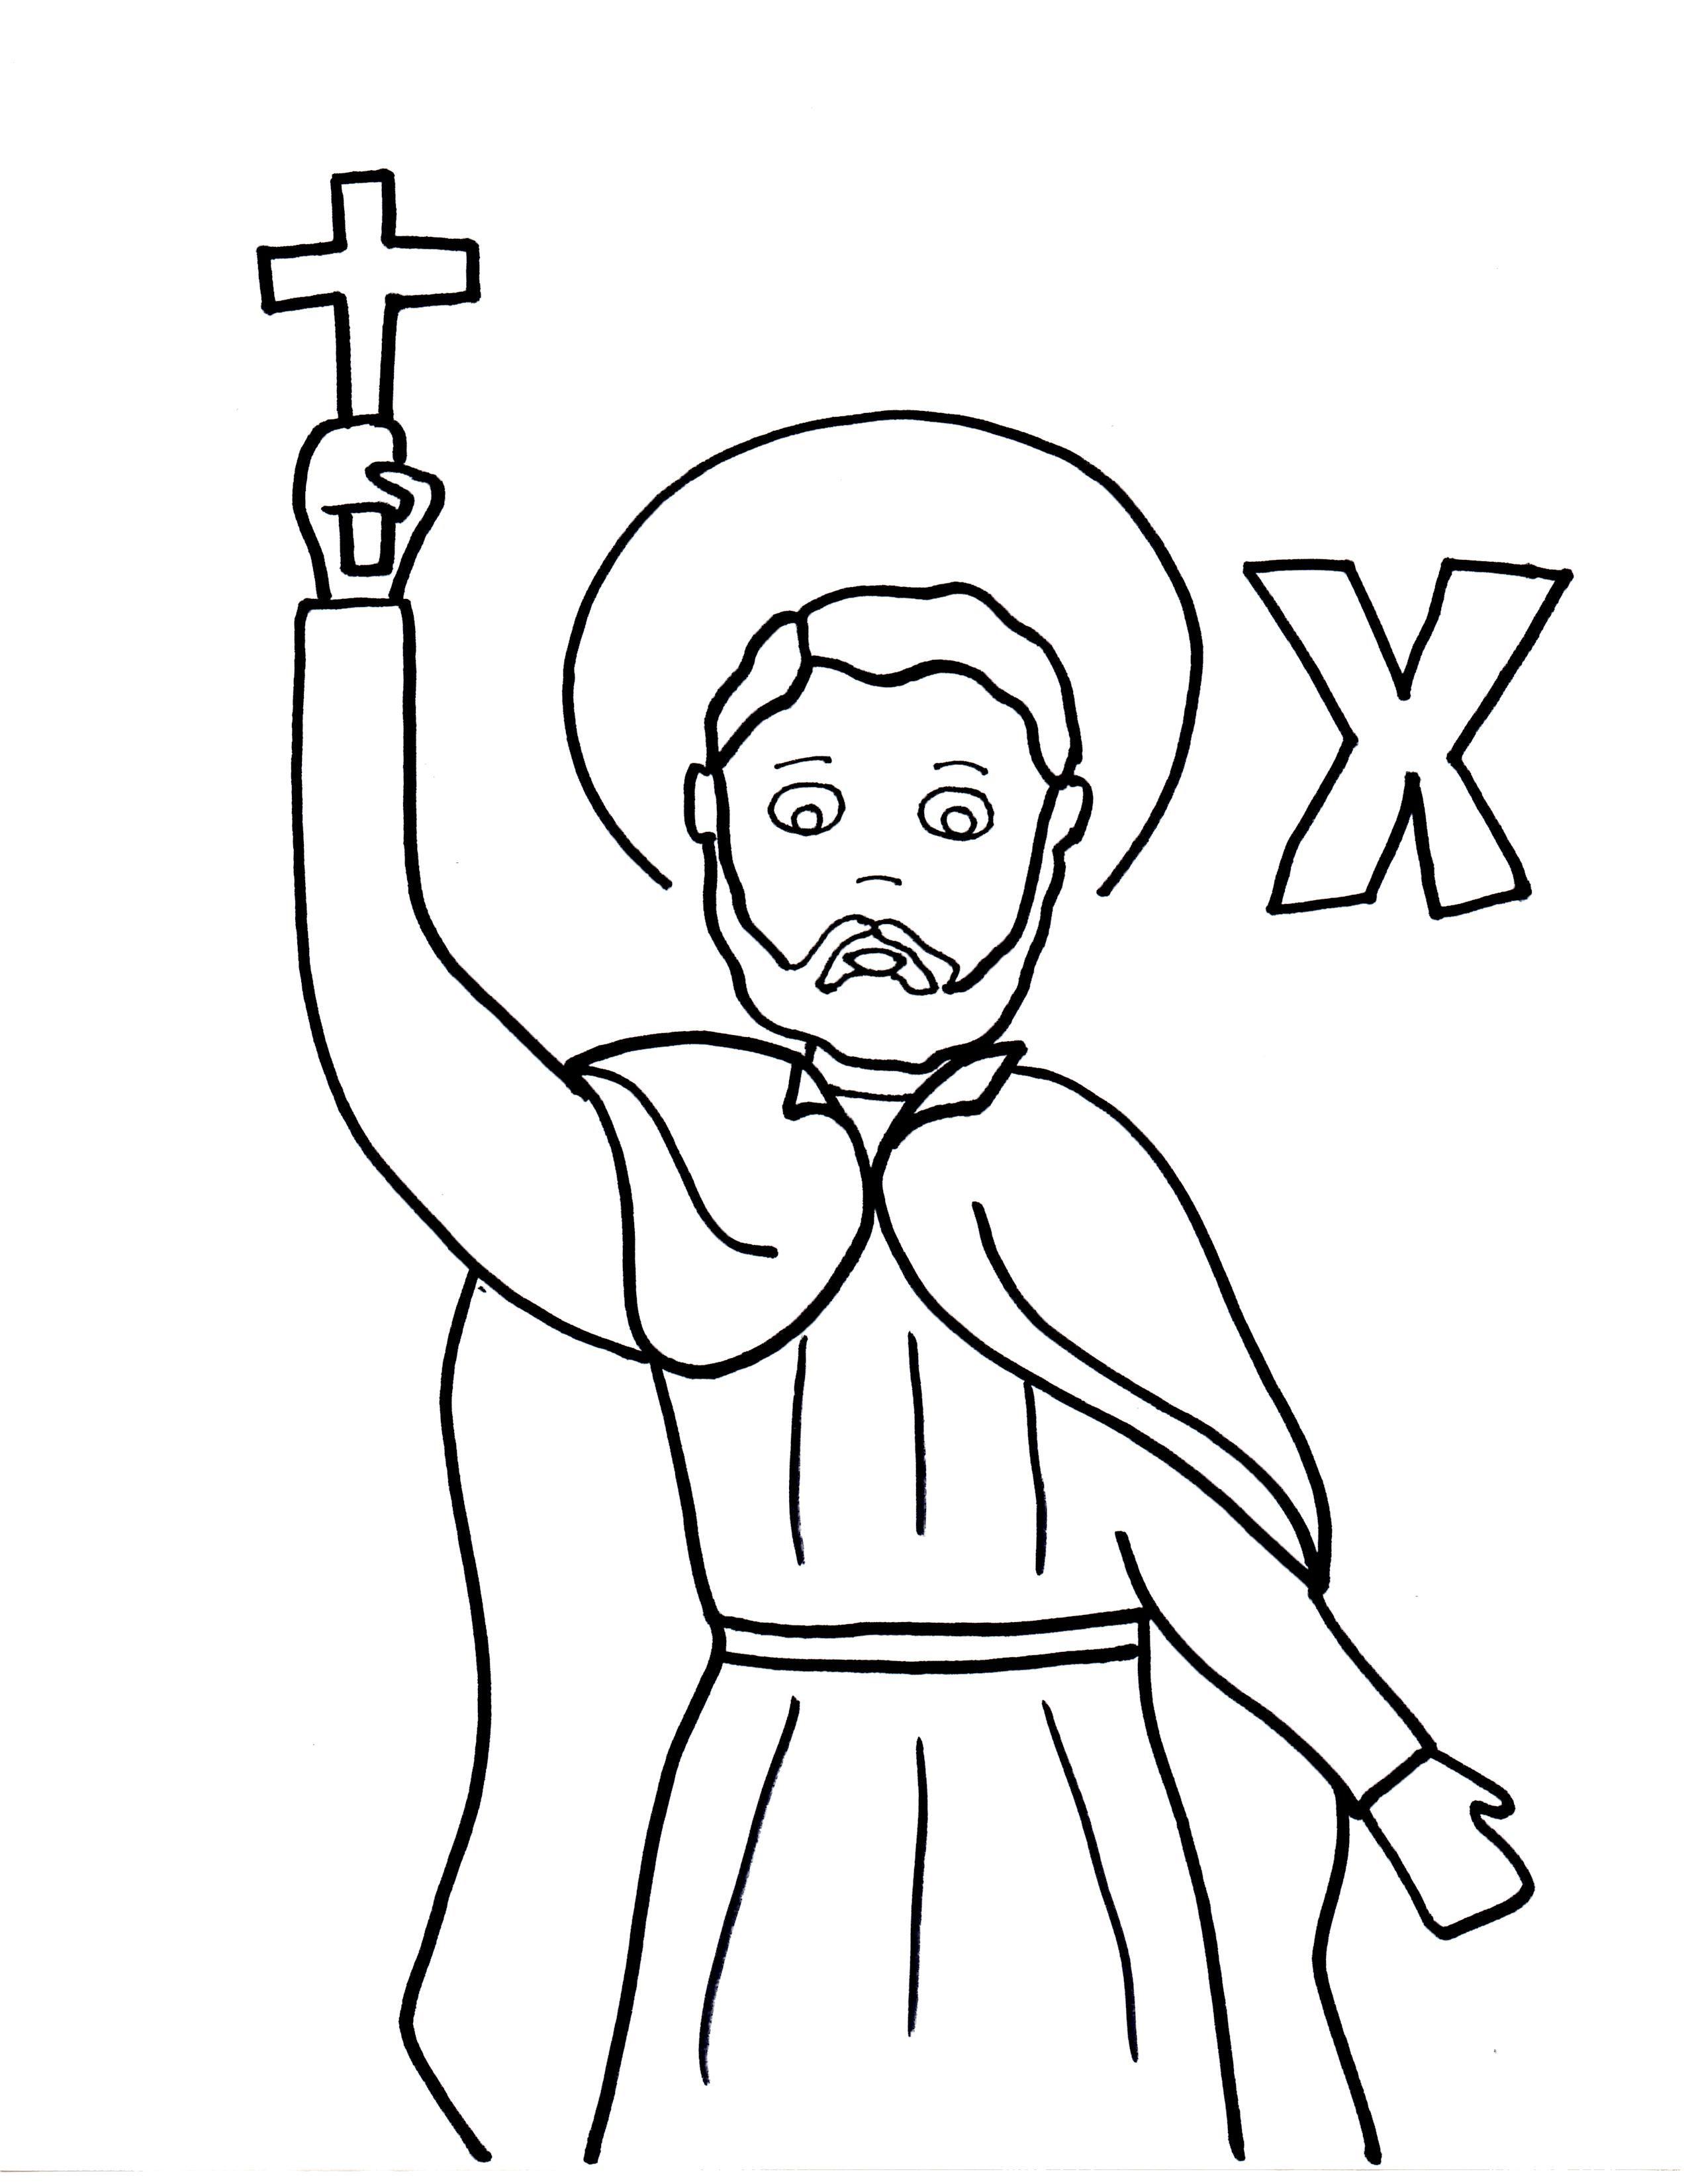 2550x3300 X Is For St Francis Xavier Francis Xavier